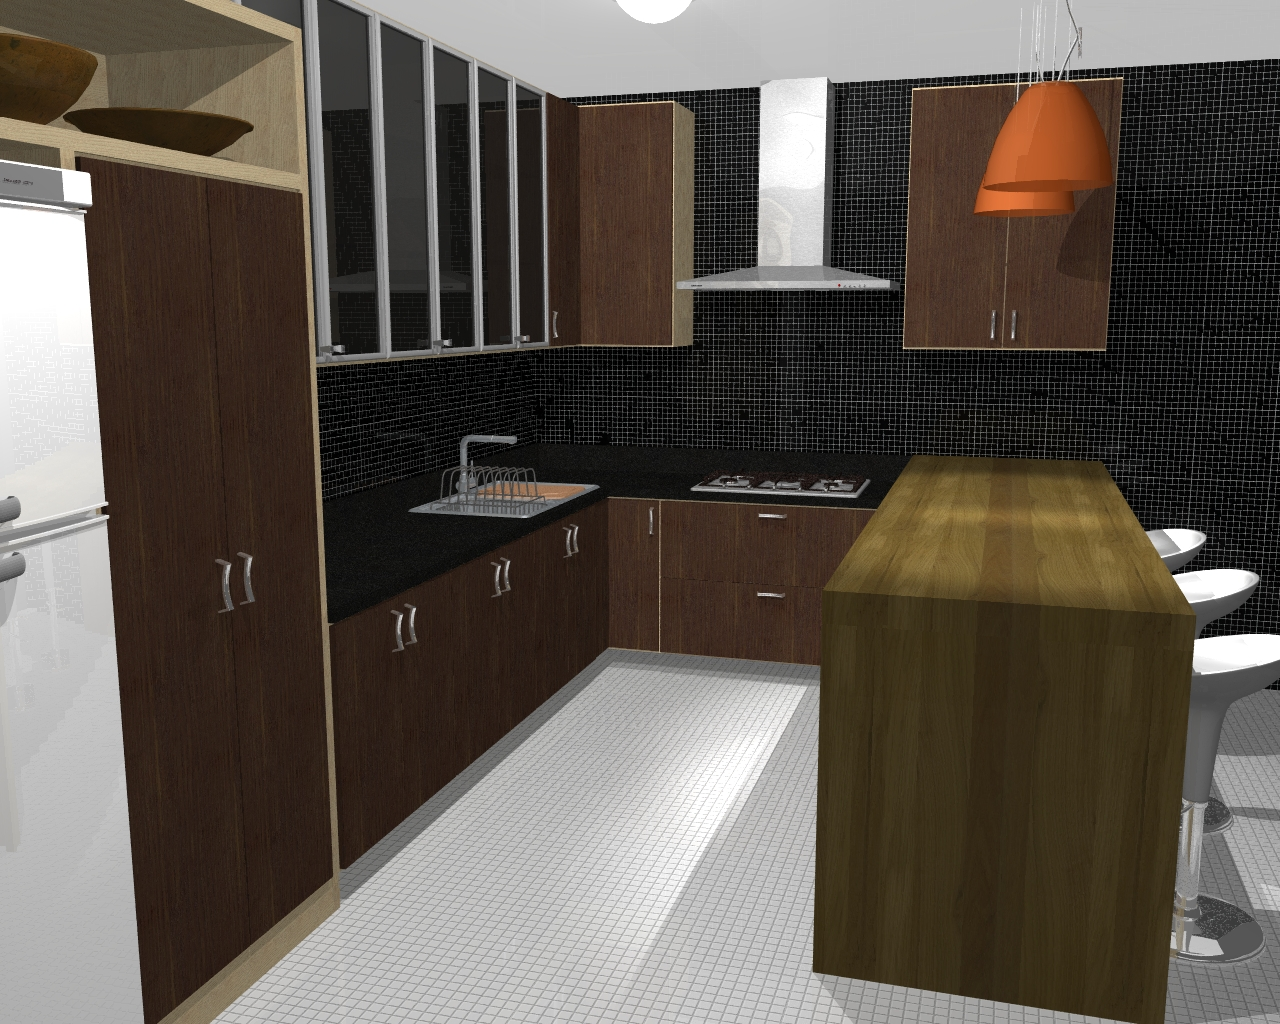 Projetos 3D #A85123 1280 1024